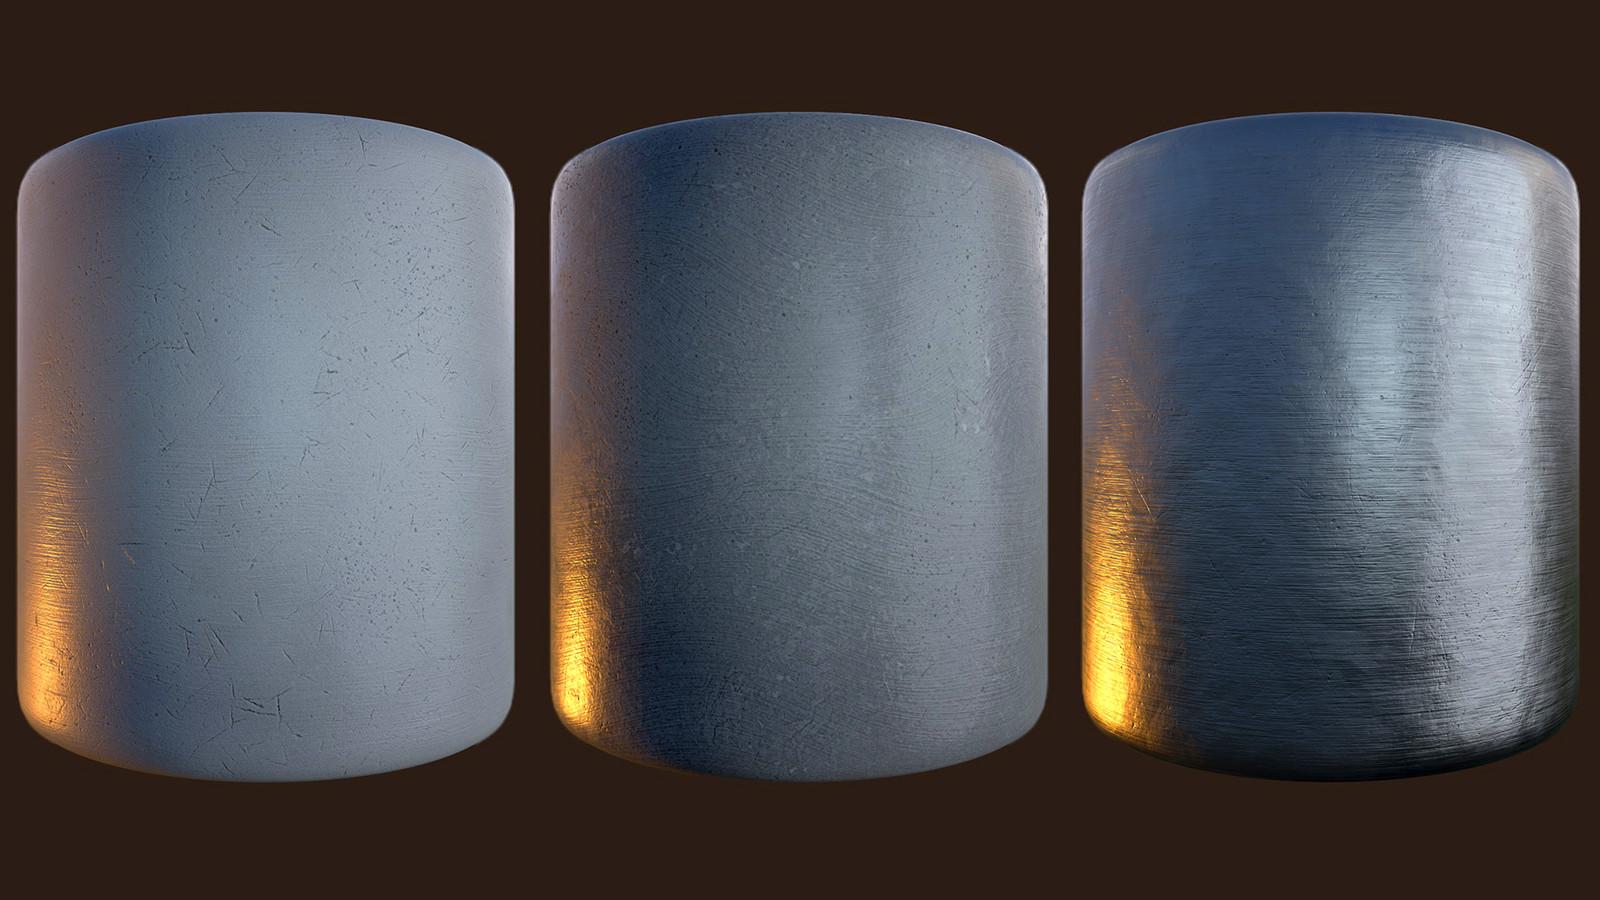 Generic Tiling Texture (Rubber - Plastic - Brushed Metal)